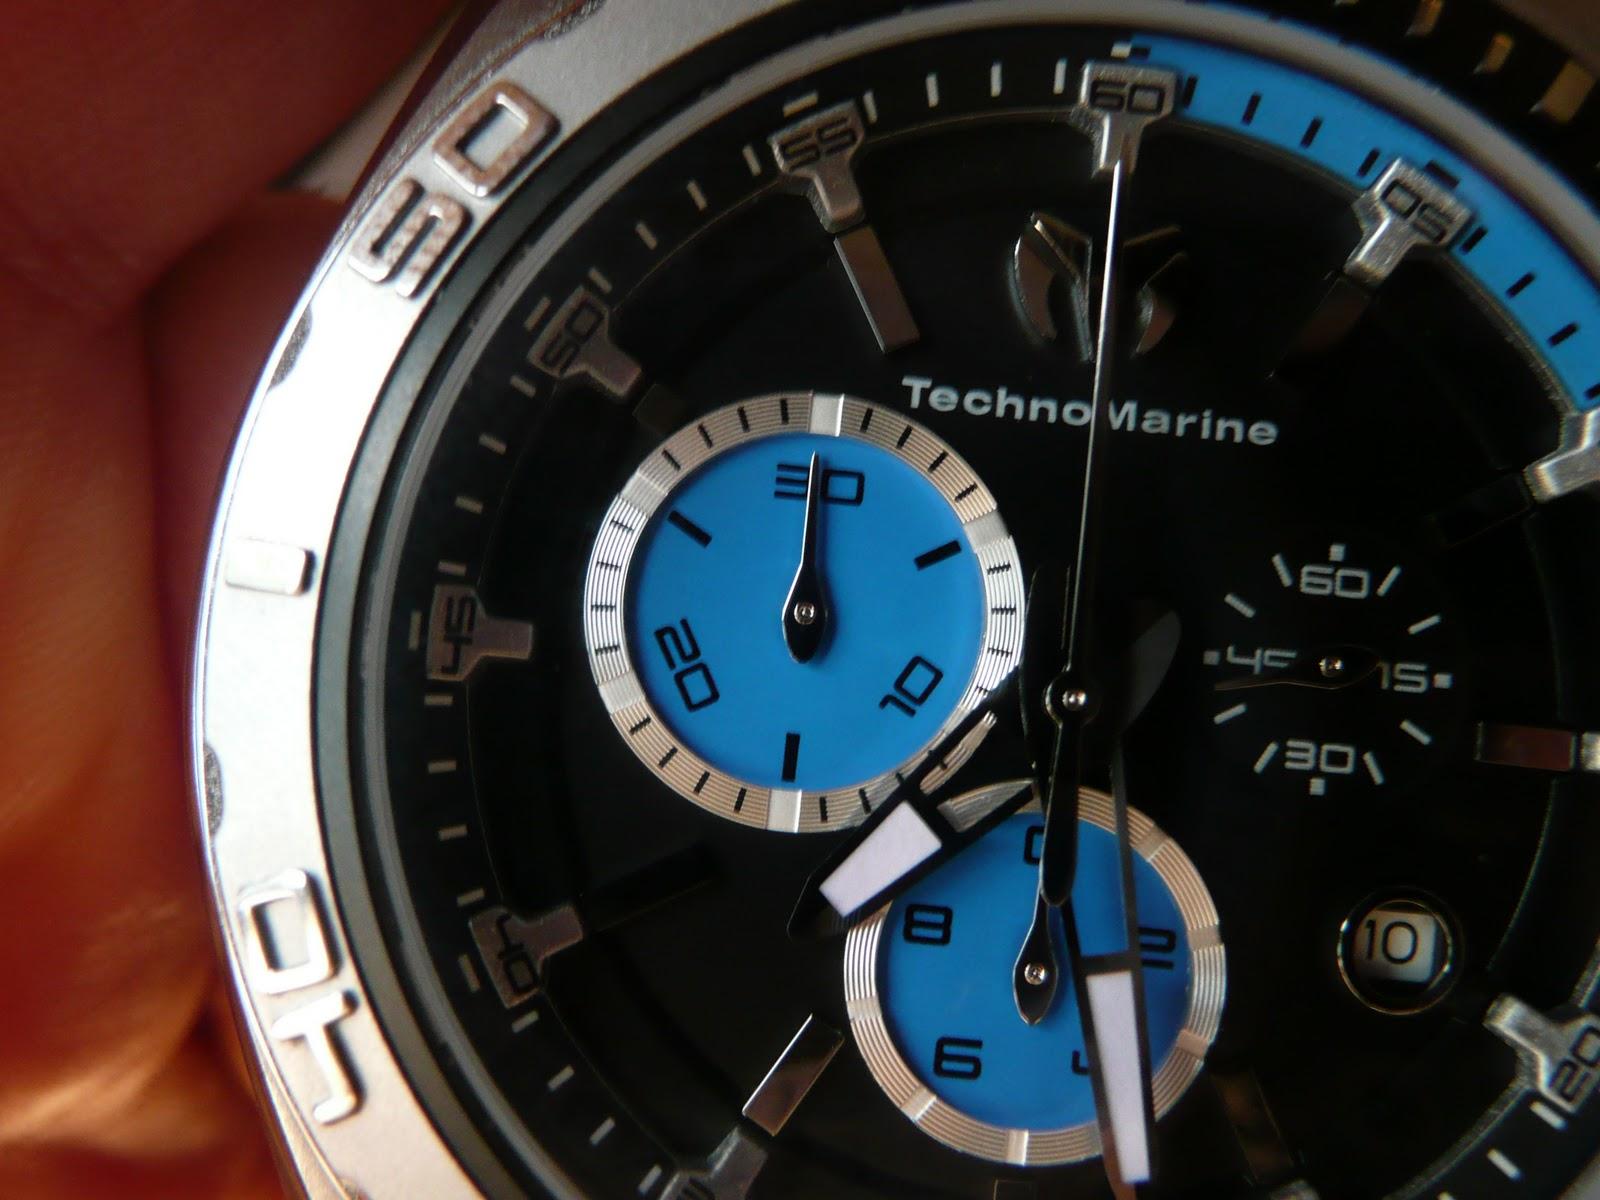 montres technomarine prix